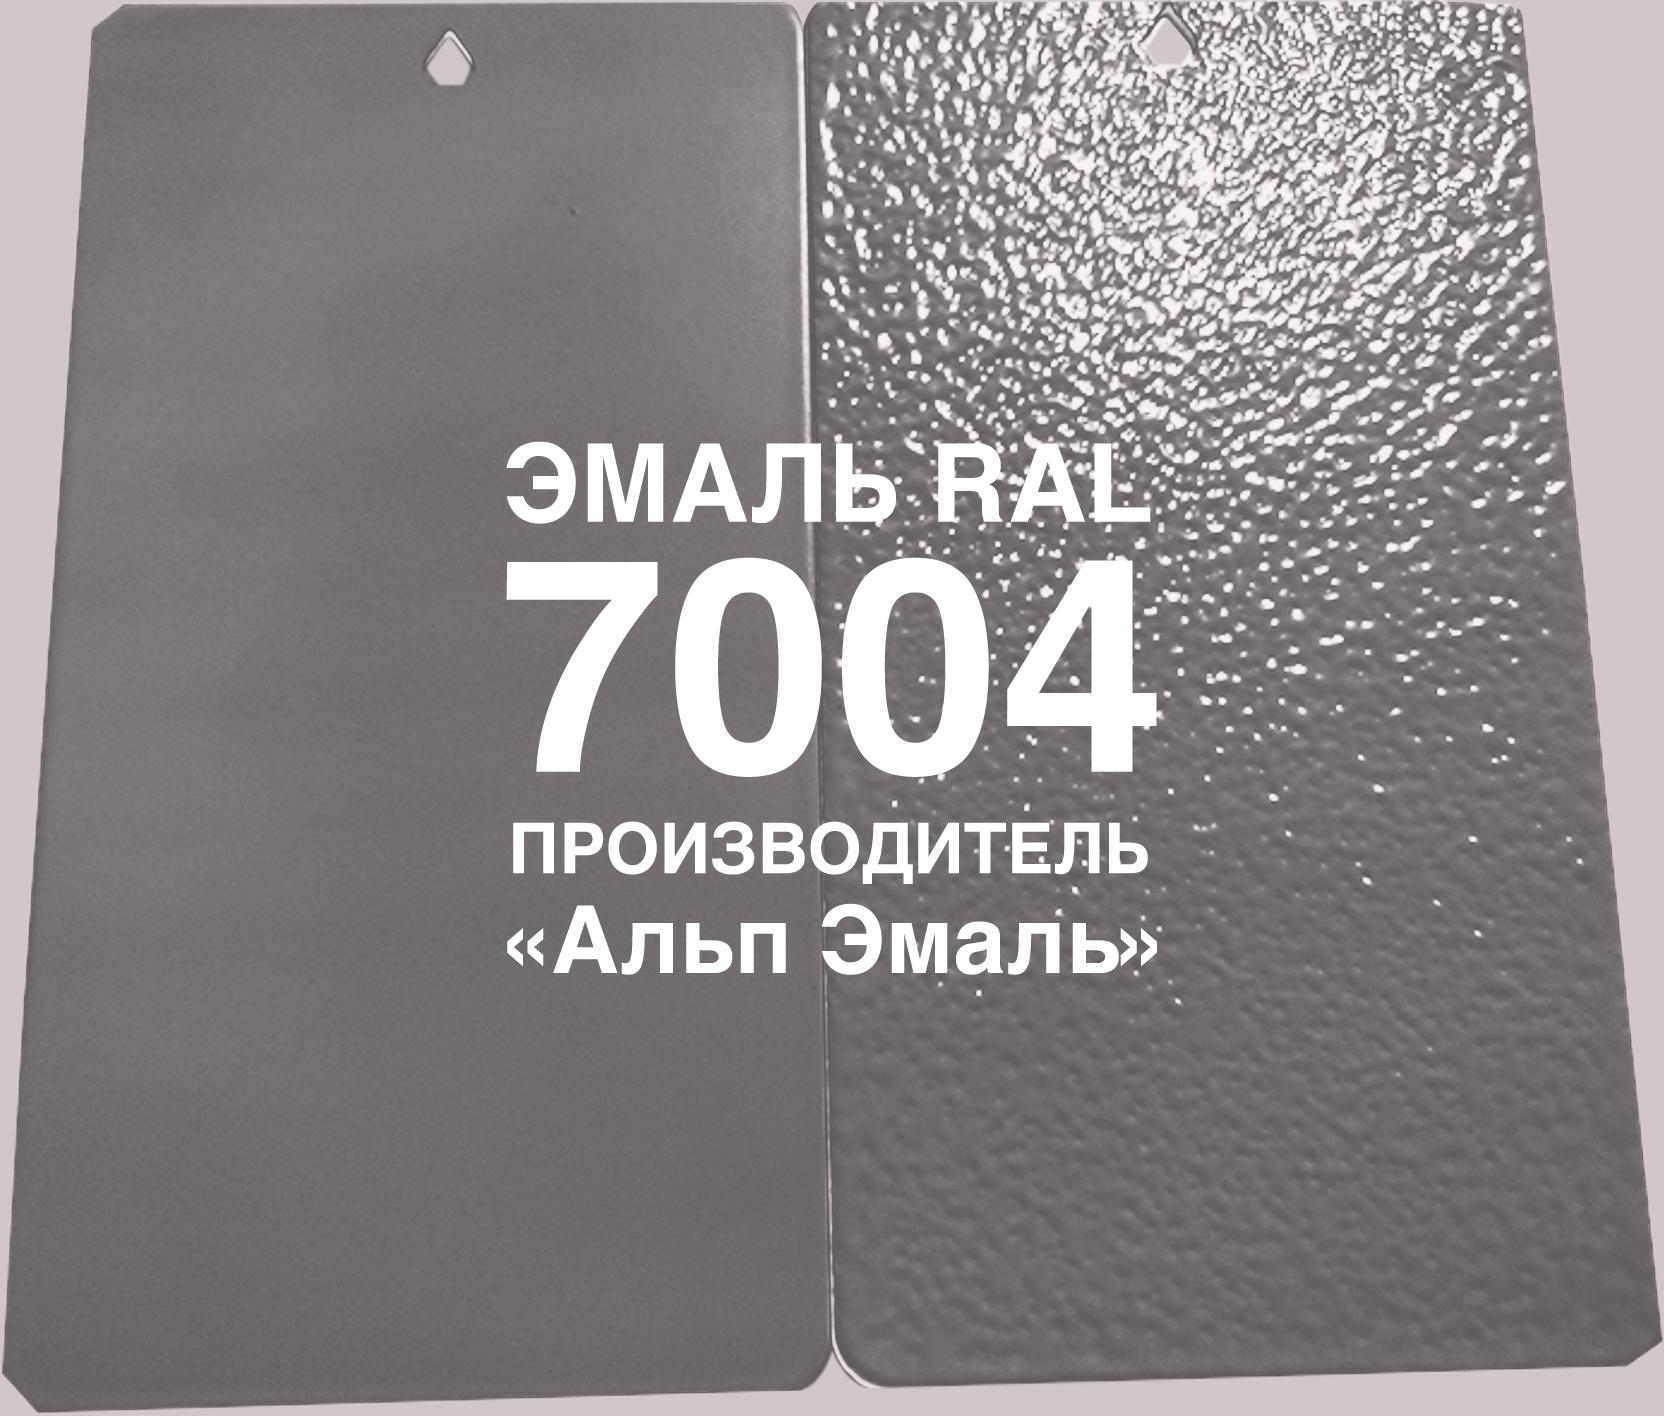 Краска эмаль RAL 7004 серая ЗАО Альп Эмаль